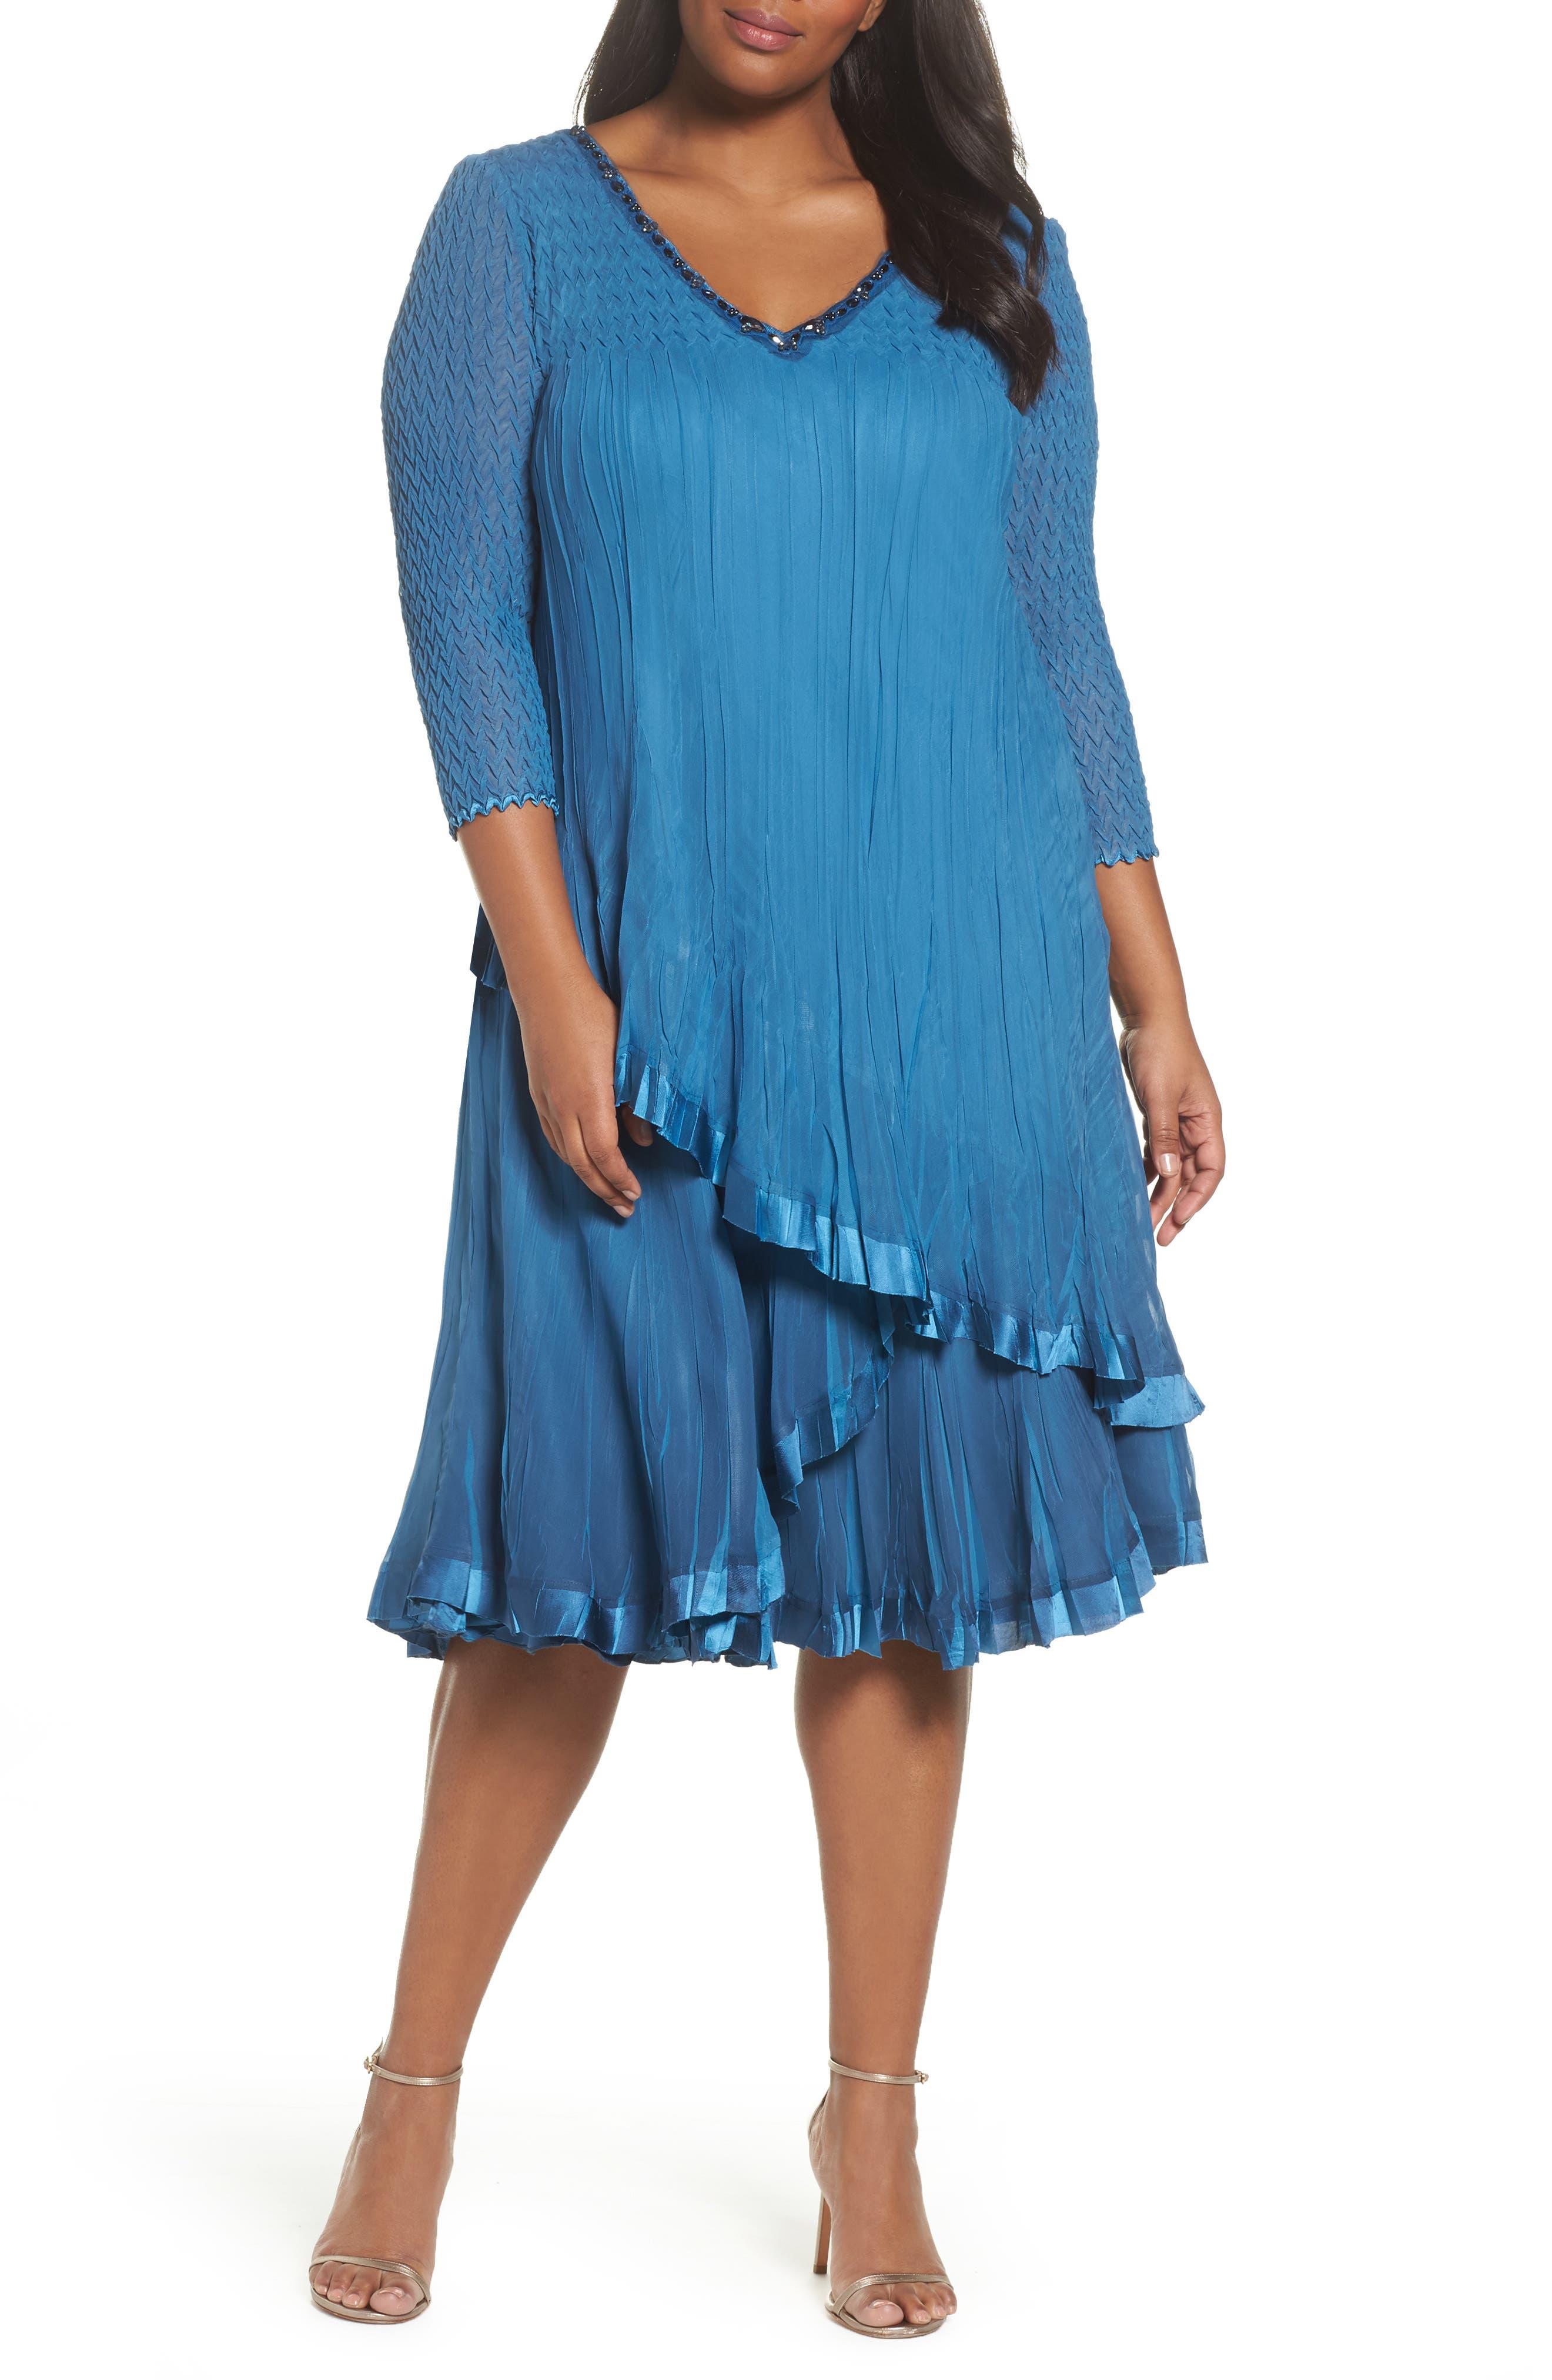 Dress Tiered Chiffon & Charmeuse Dress,                             Main thumbnail 1, color,                             400